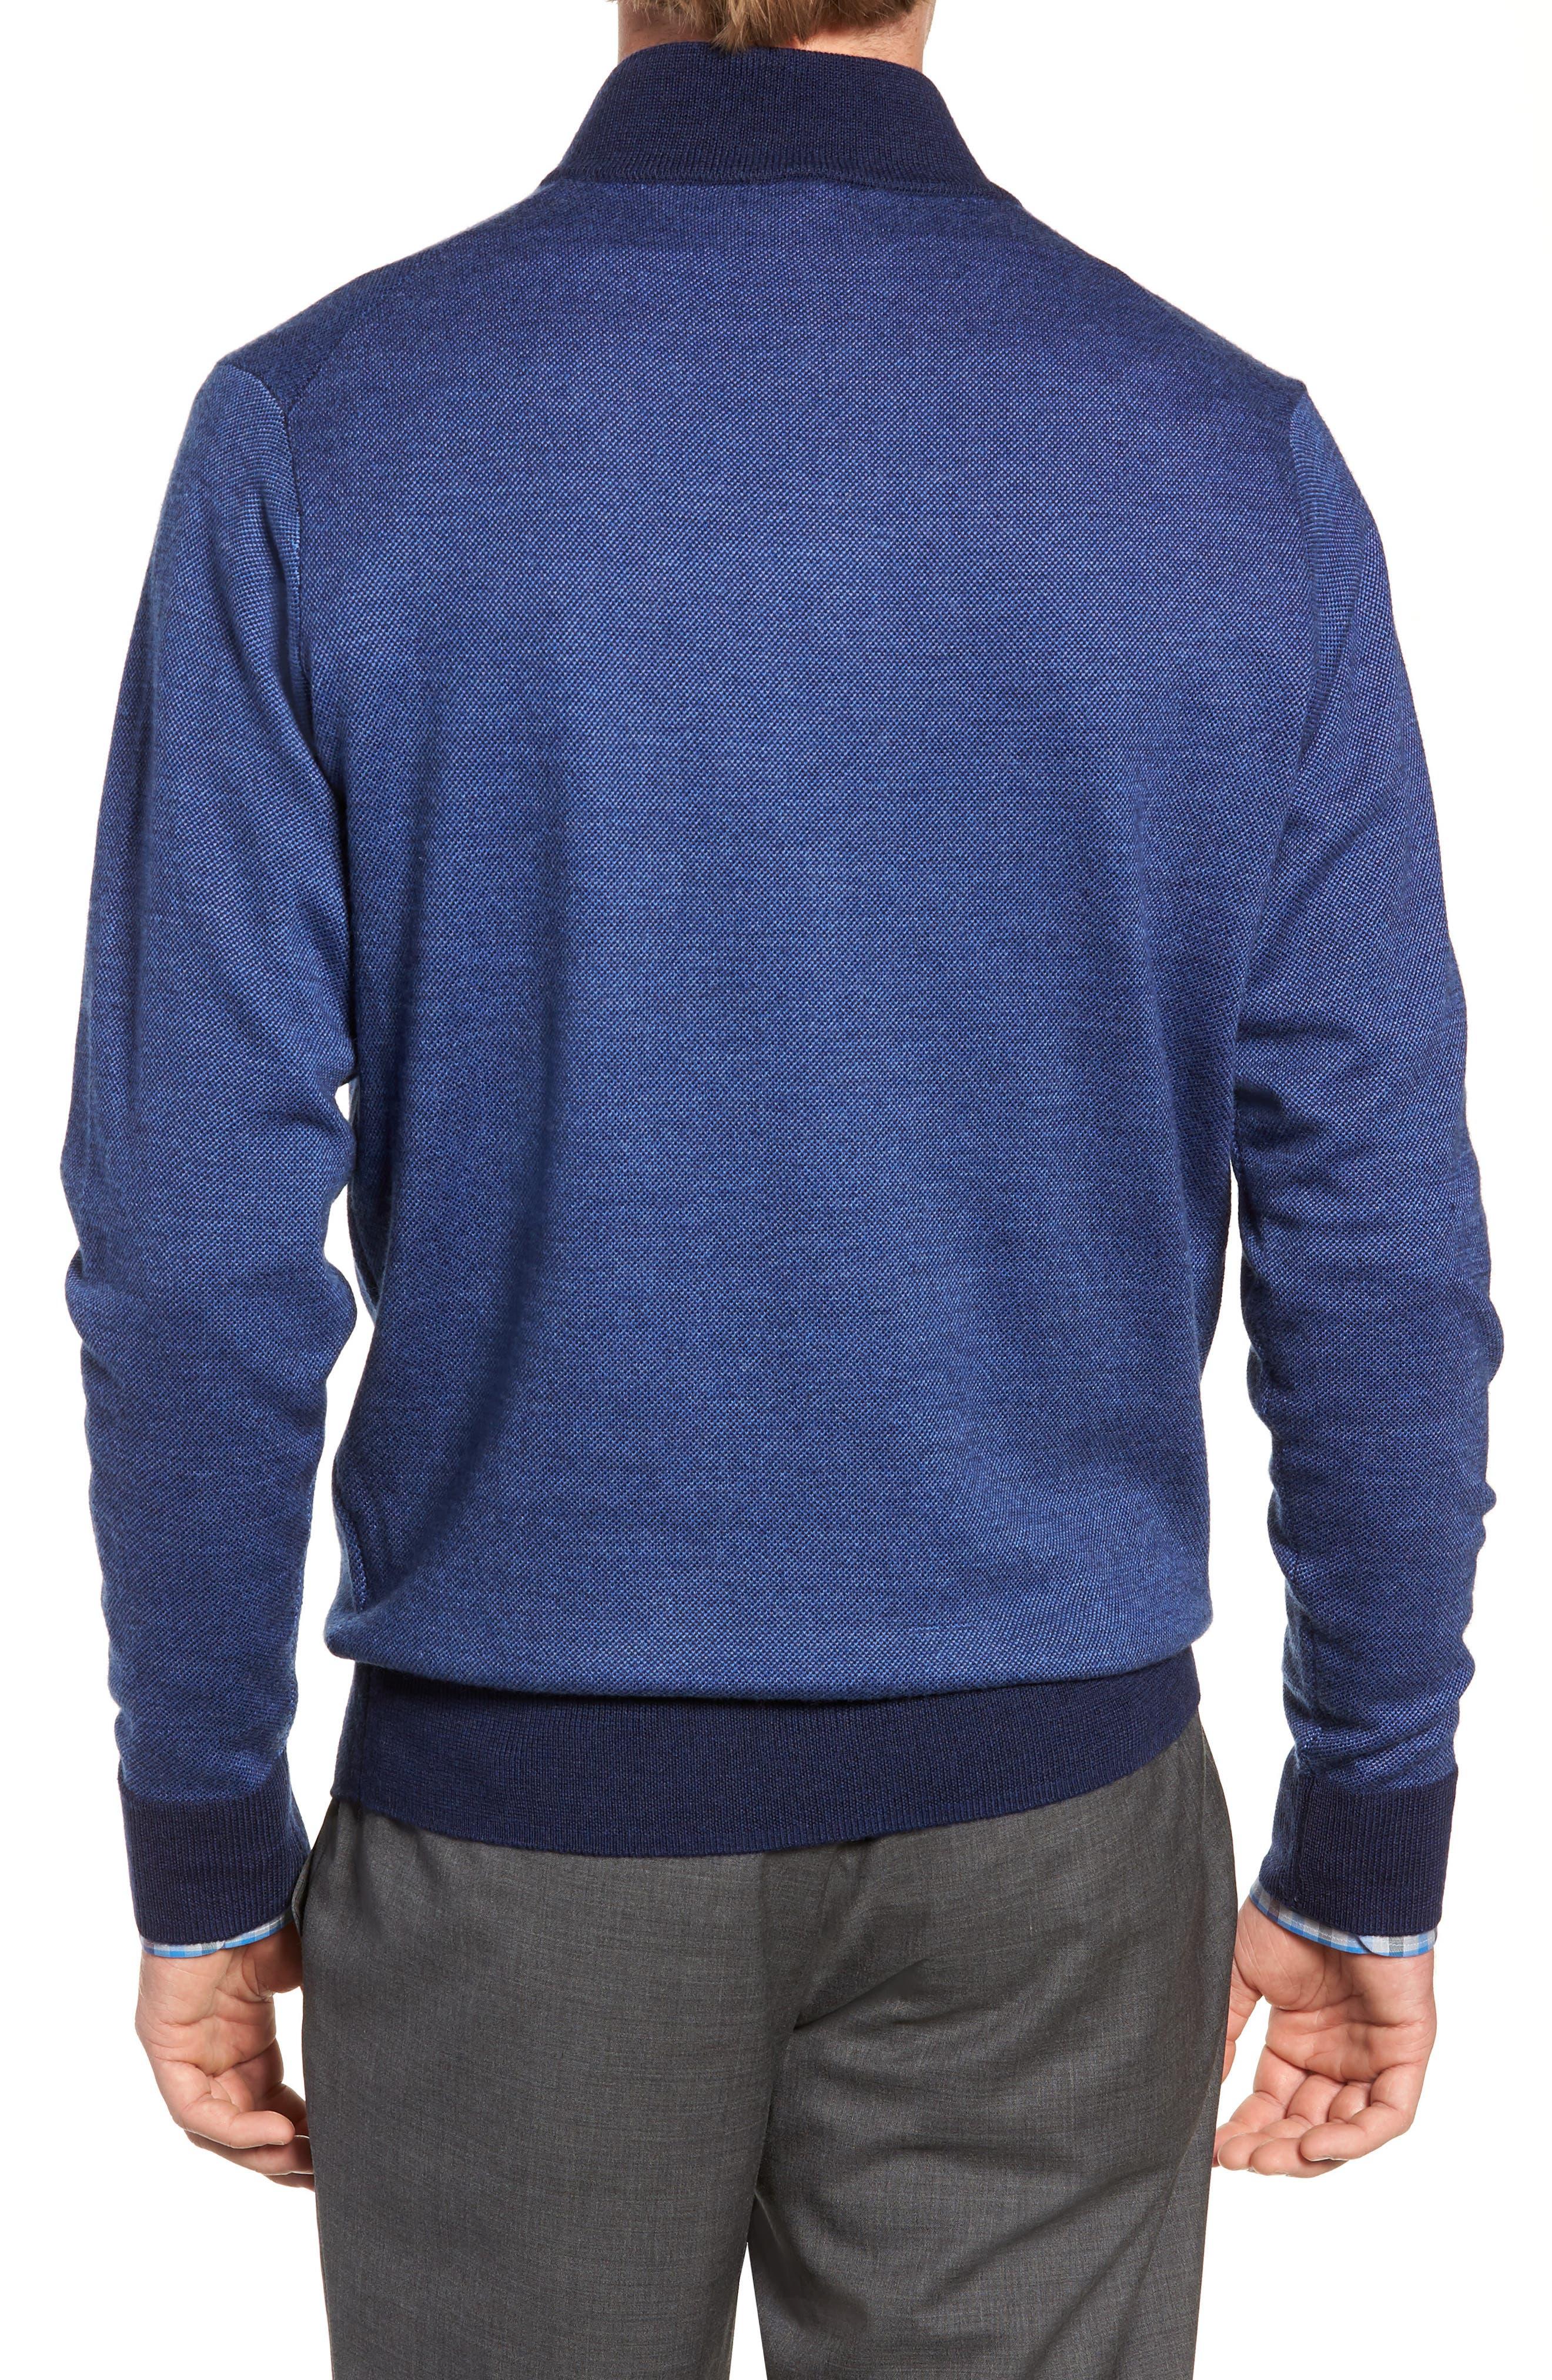 Birdseye Merino Wool Quarter Zip Sweater,                             Alternate thumbnail 2, color,                             PLAZA BLUE